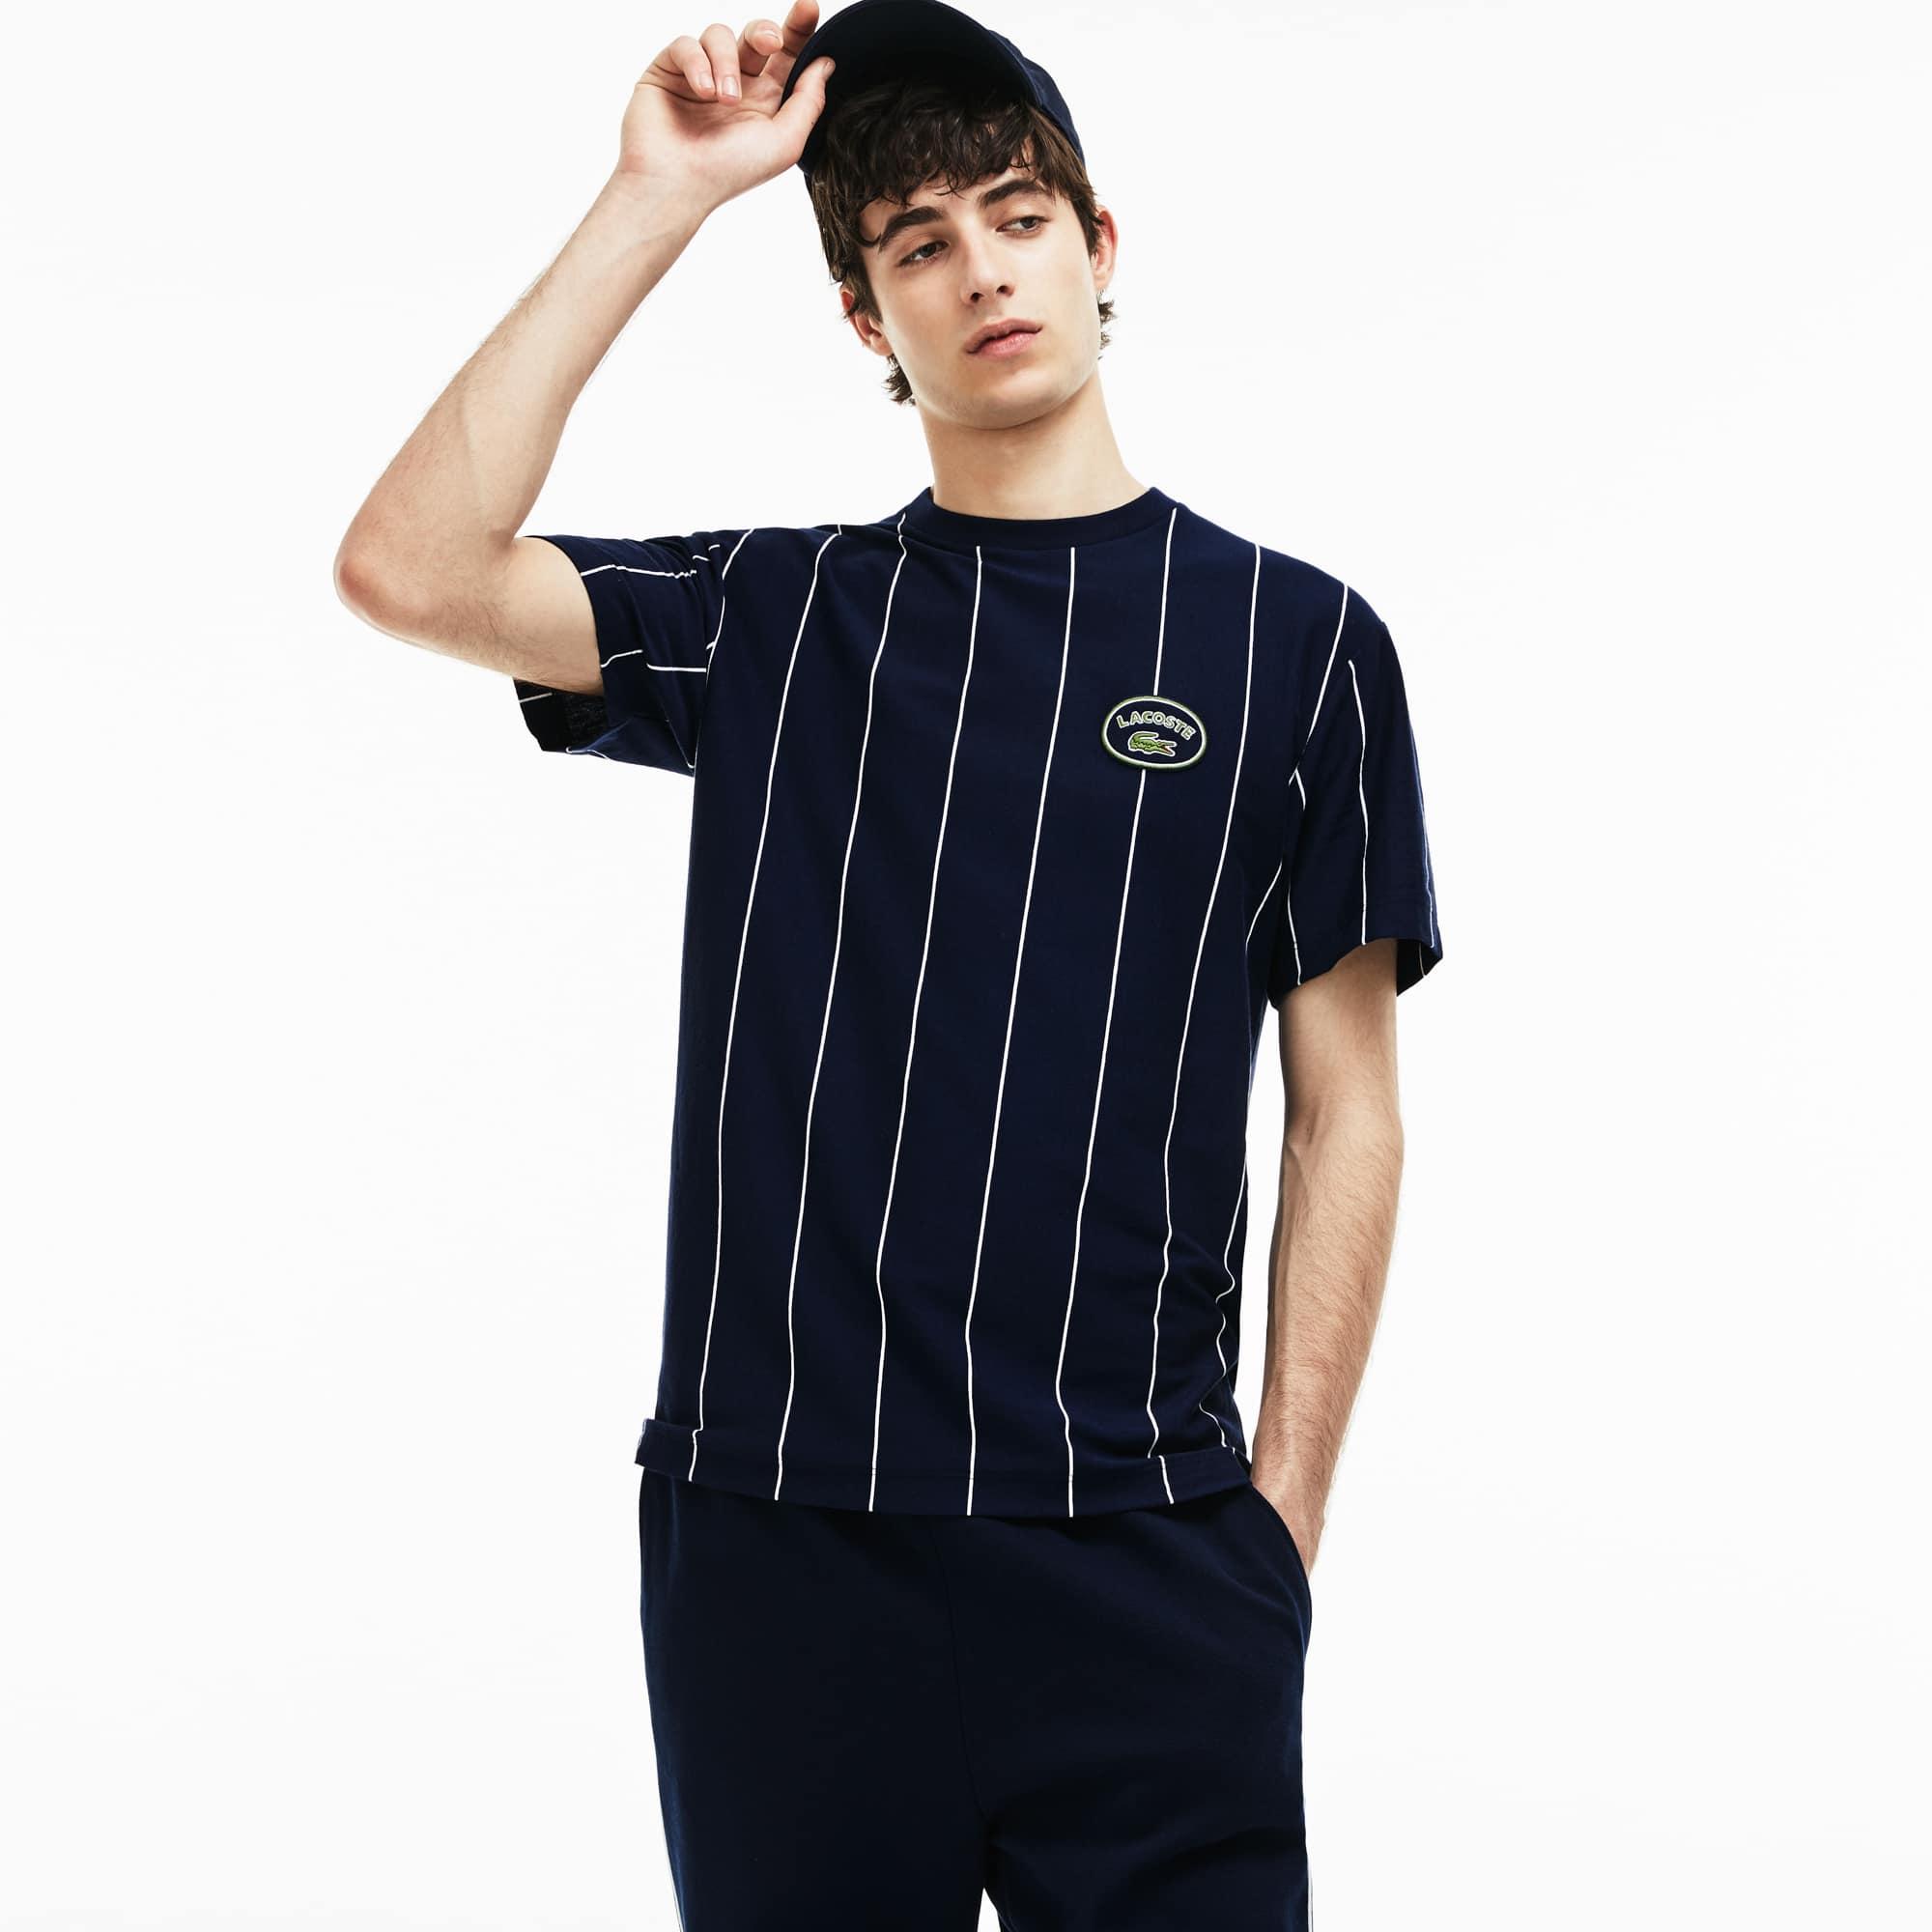 Men's Crew Neck Vertically Striped Cotton Jersey T-shirt